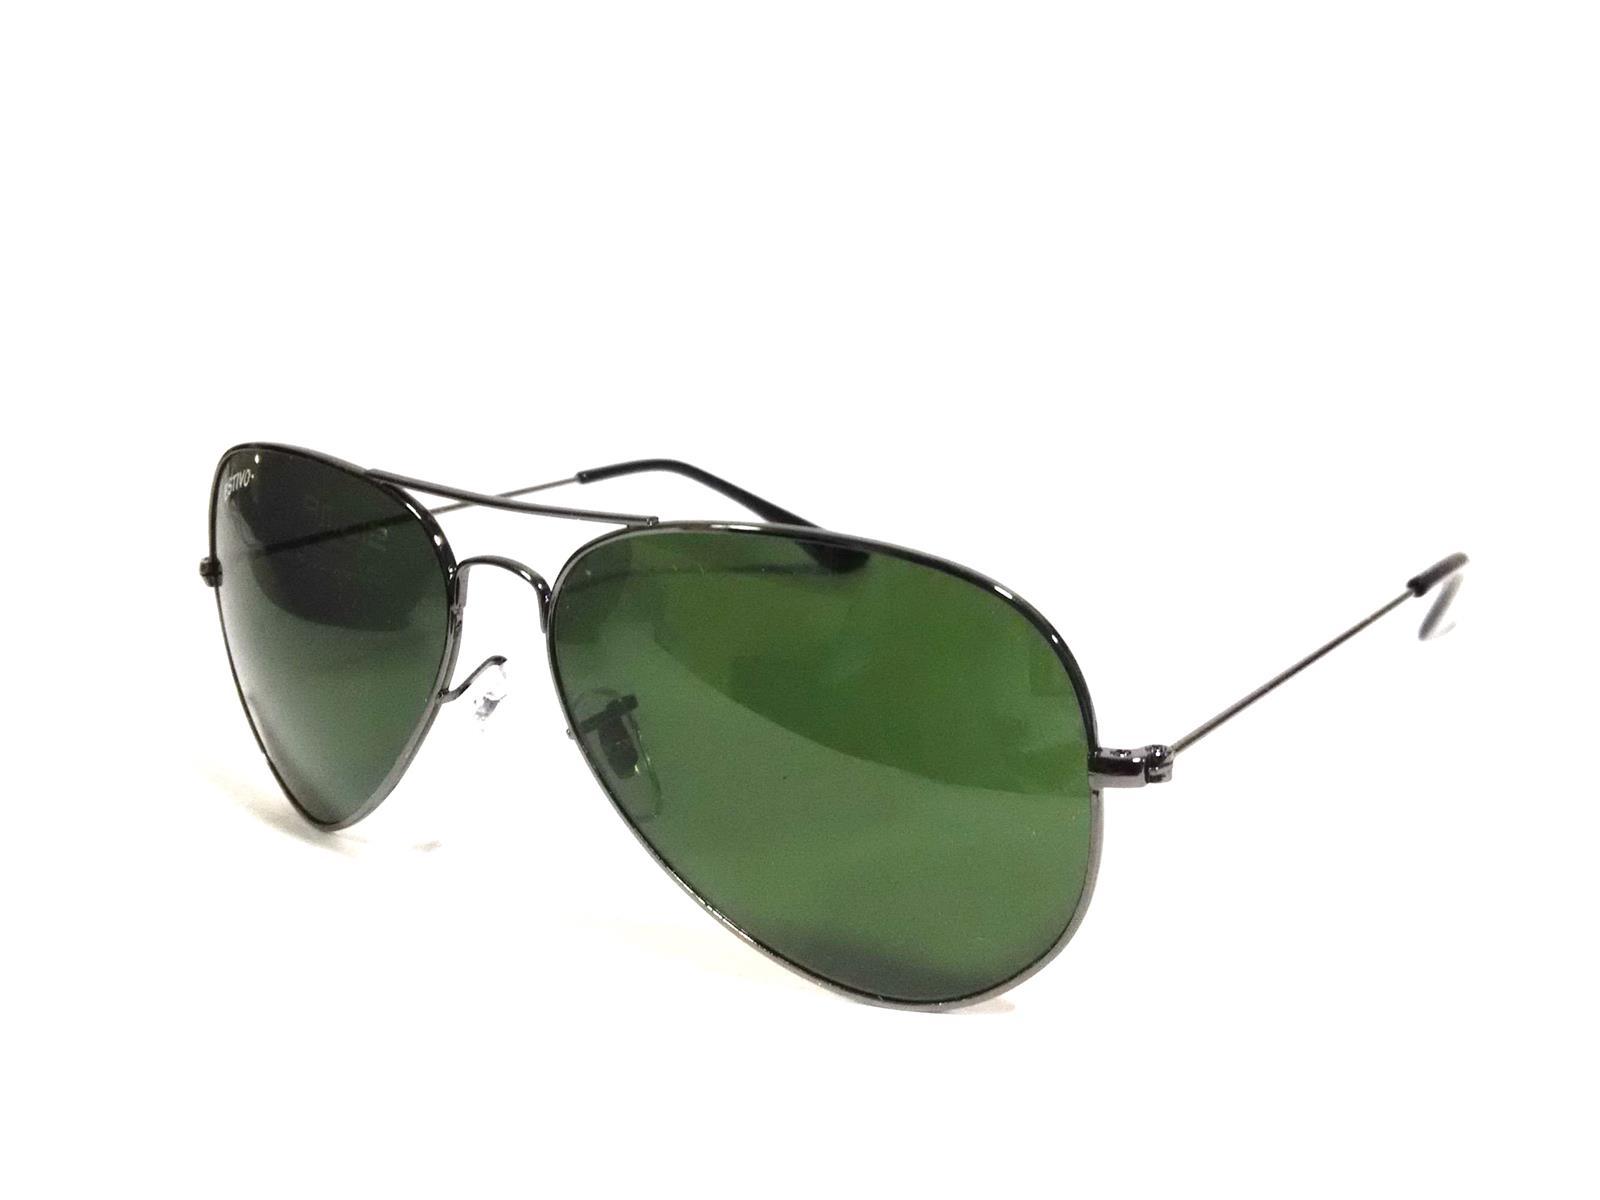 Gunmetal Aviator Sunglasses for Men and Women es25gm